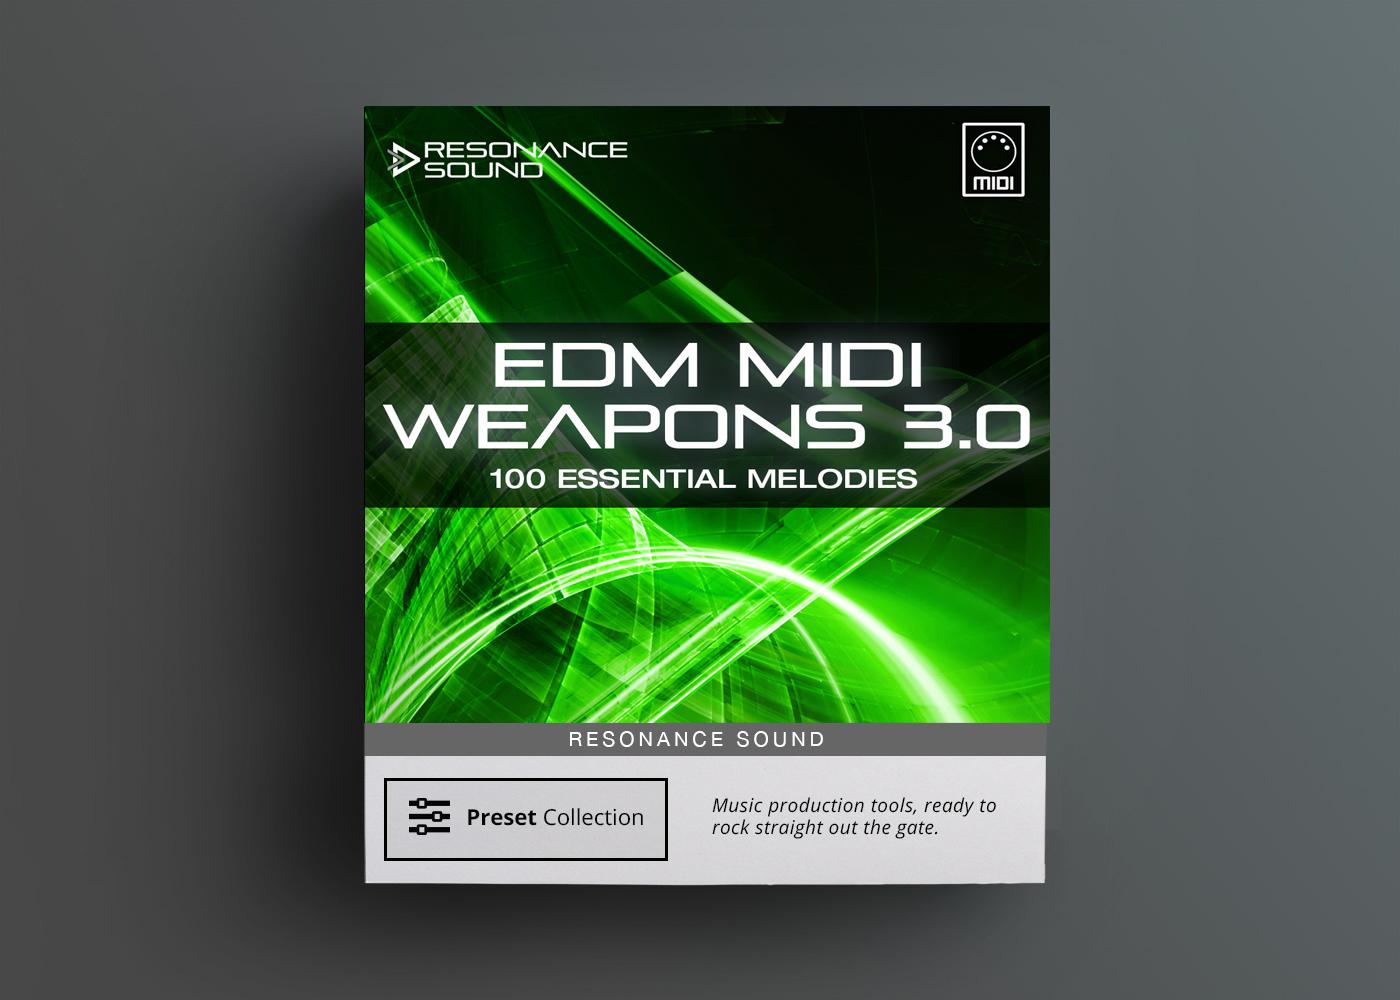 resonance-sound-edm-midi-weapons